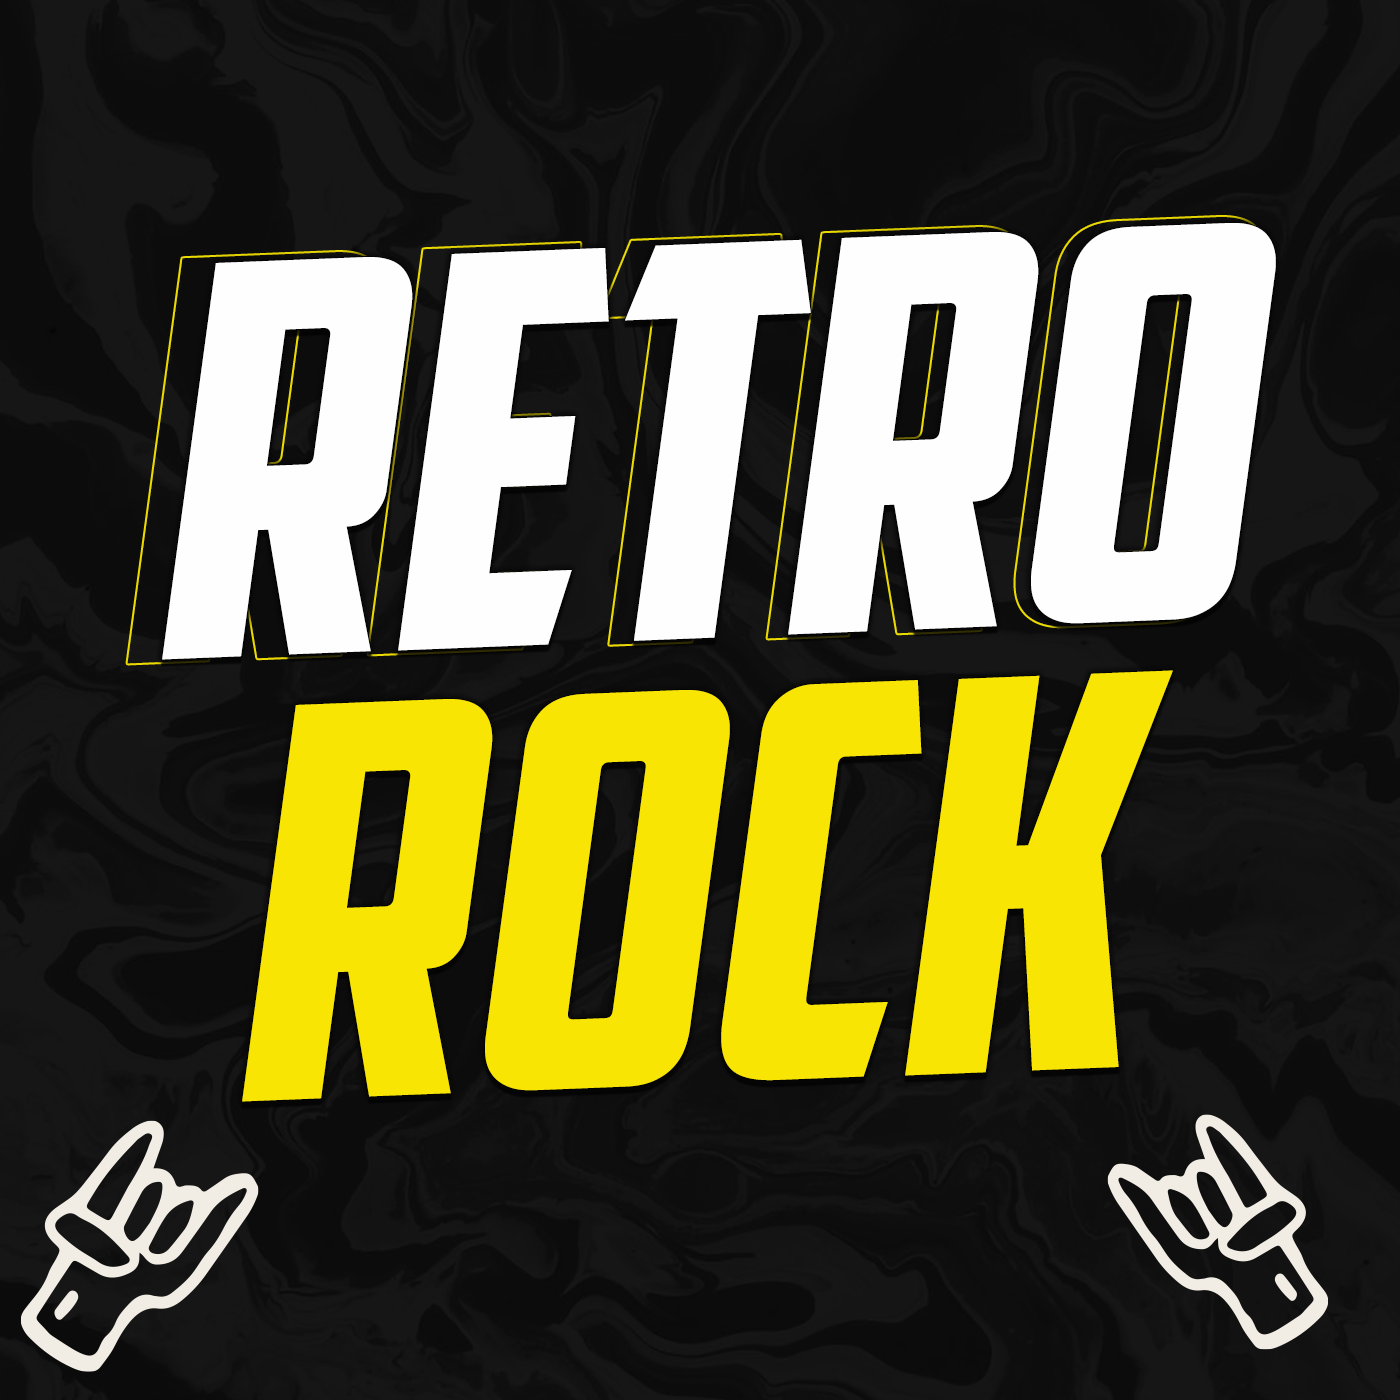 Retro Rock (13/10/2021 - Tramo de 11:00 a 12:00)